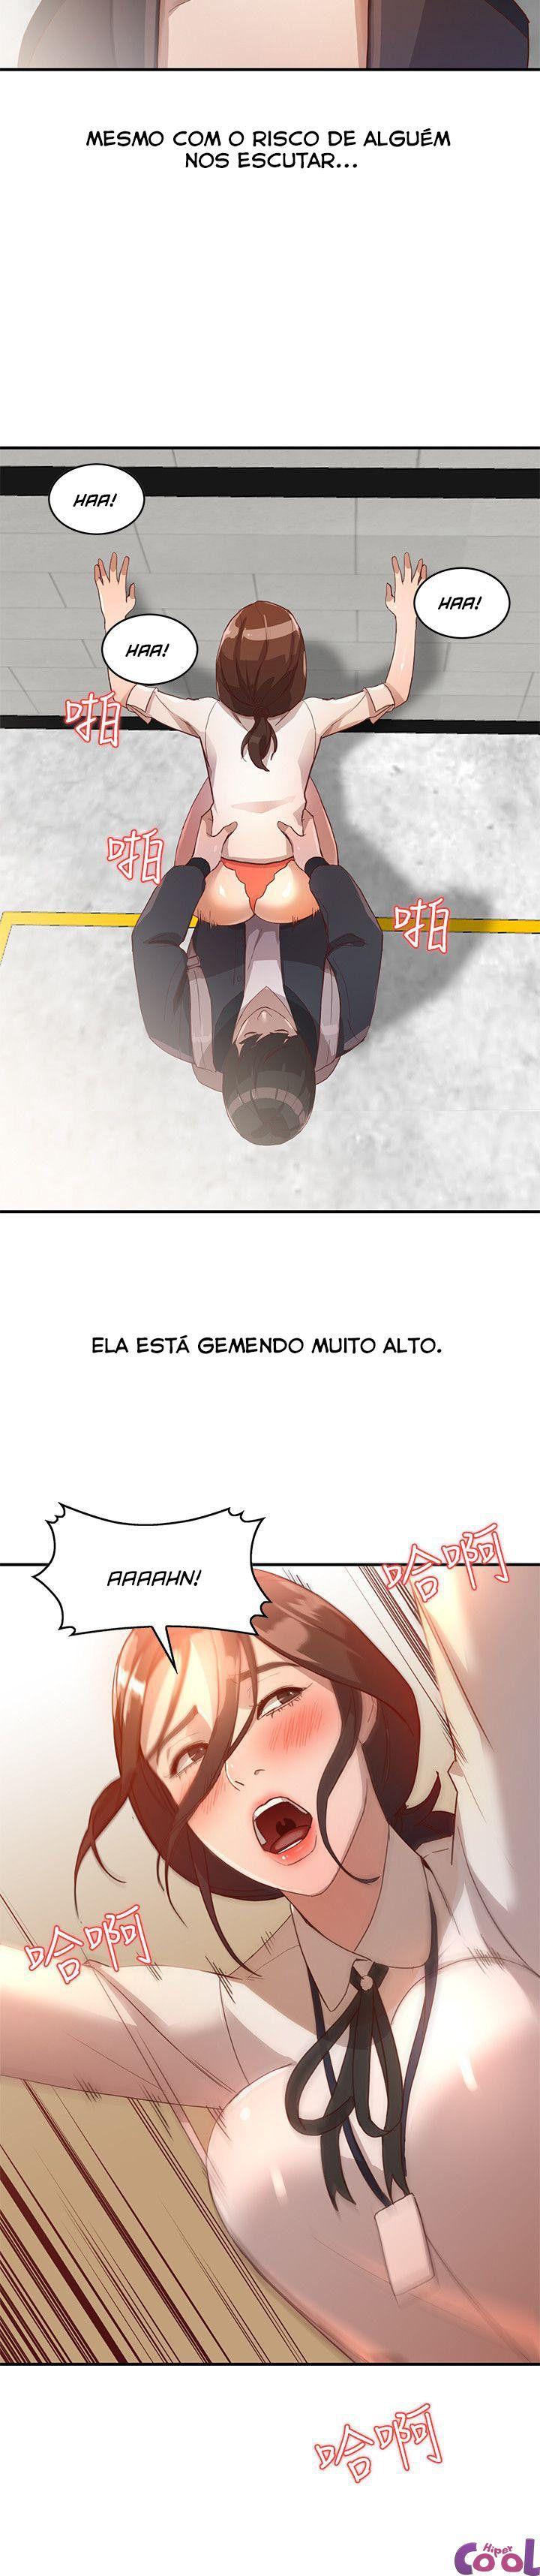 Mulher Casada 04 - Foto 9